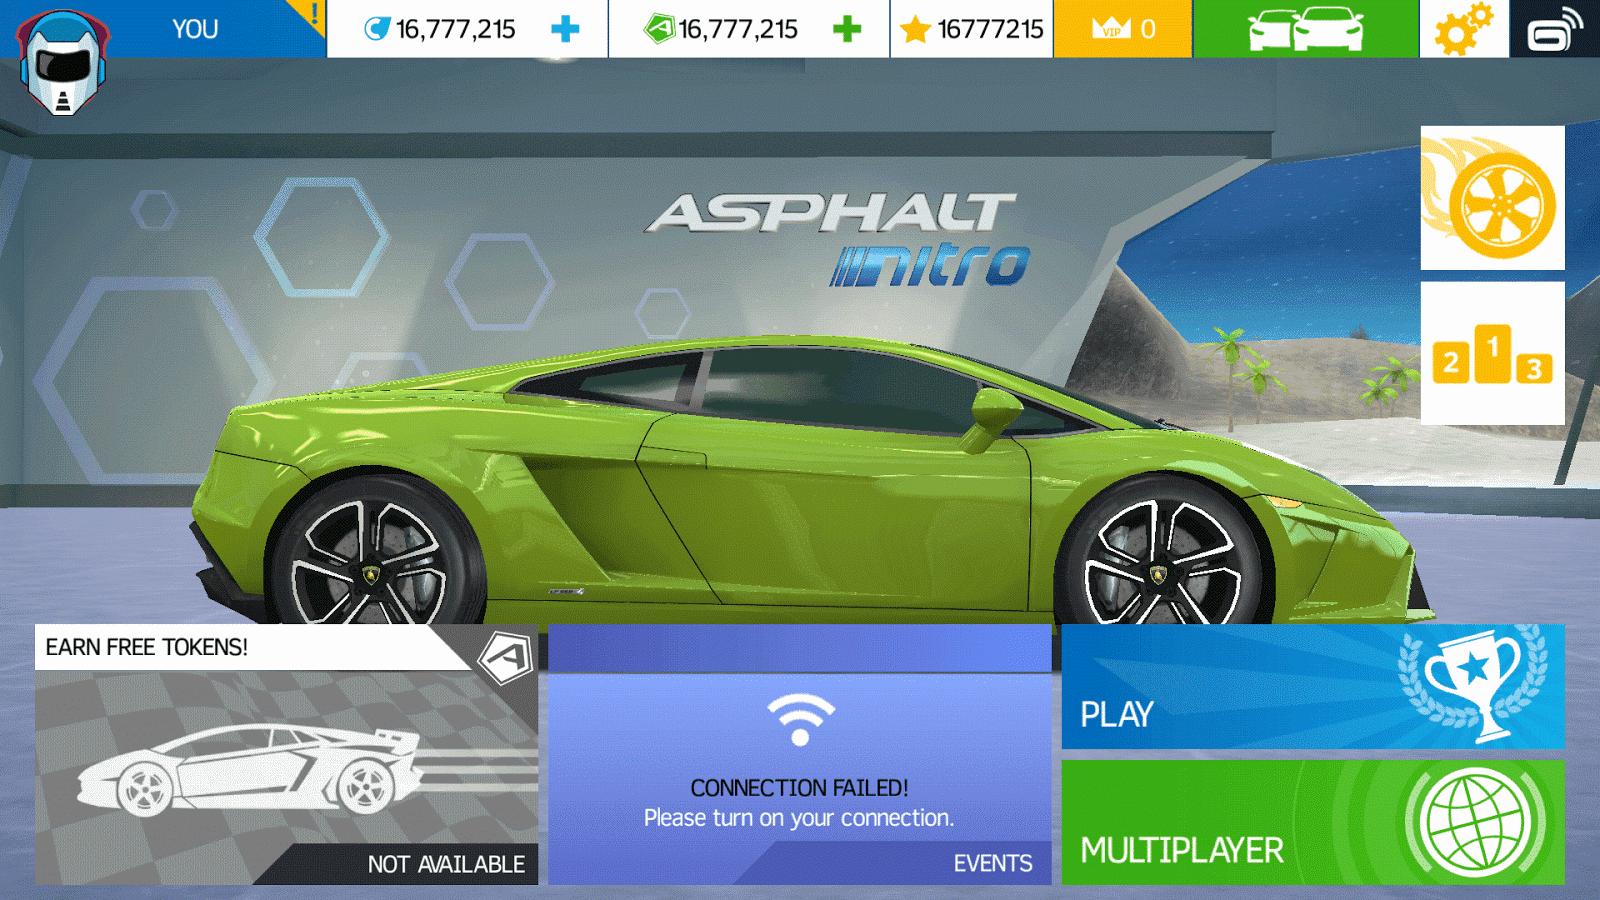 Asphalt Nitro V1 5 0g Mod Apk 1 5 0g Hack No Root Android Latest